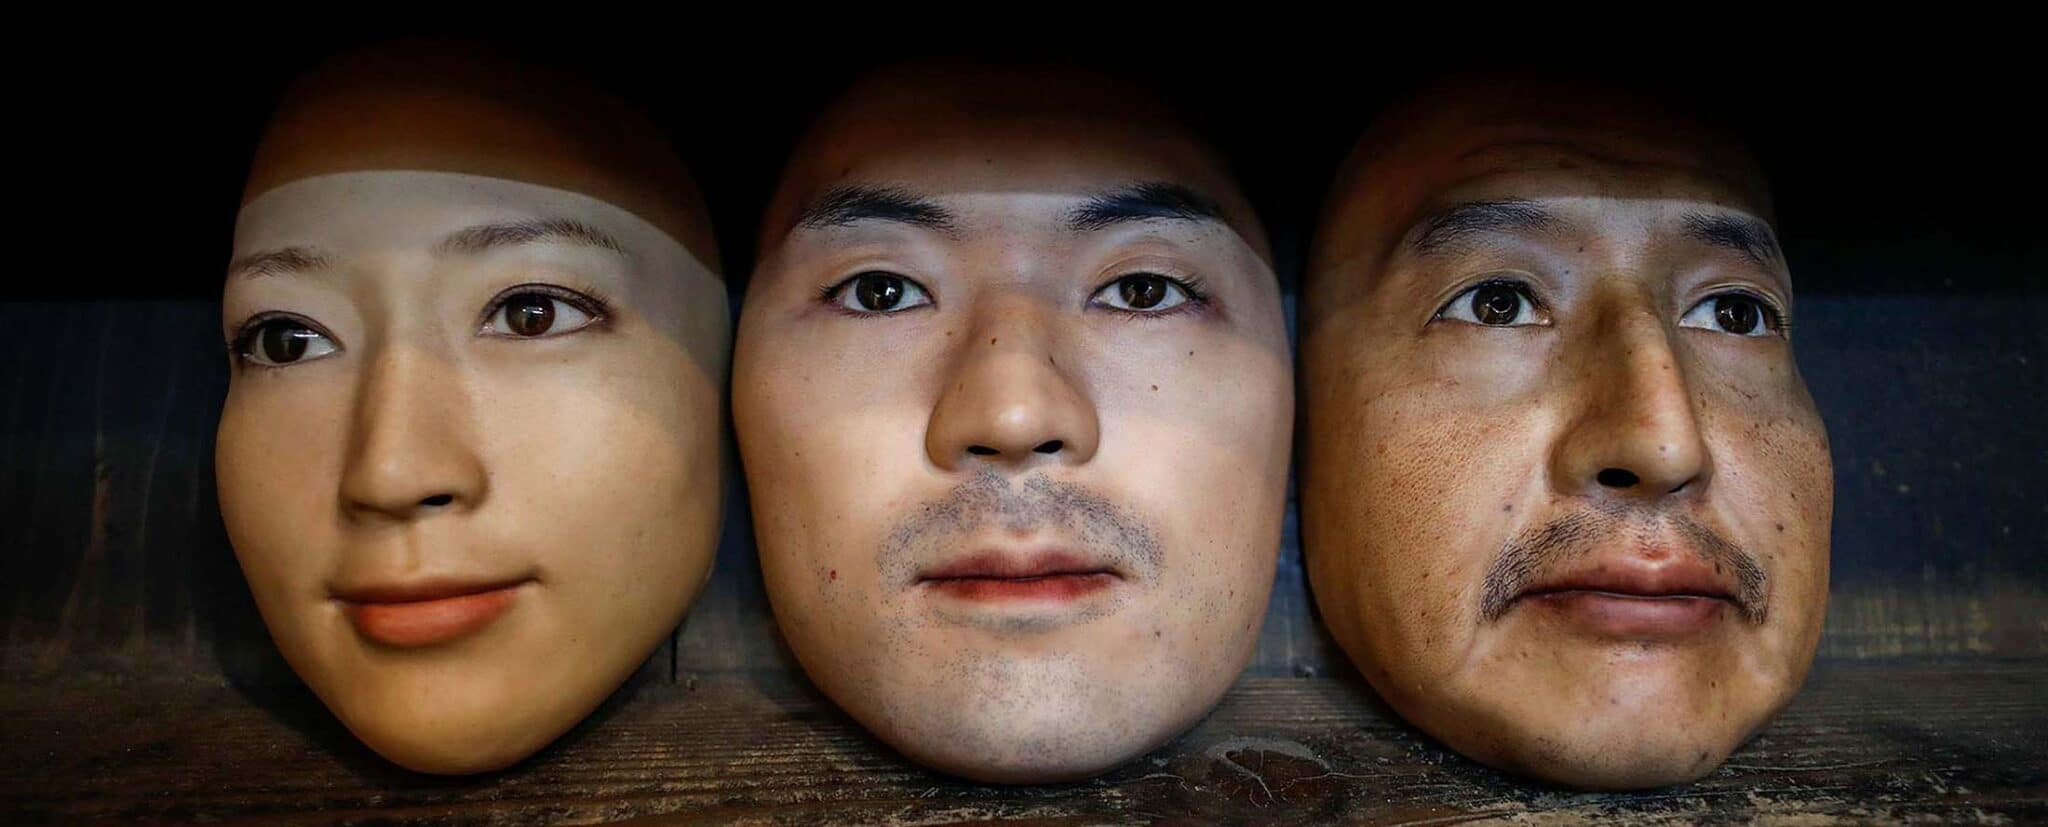 maschere realistiche stampate in 3D